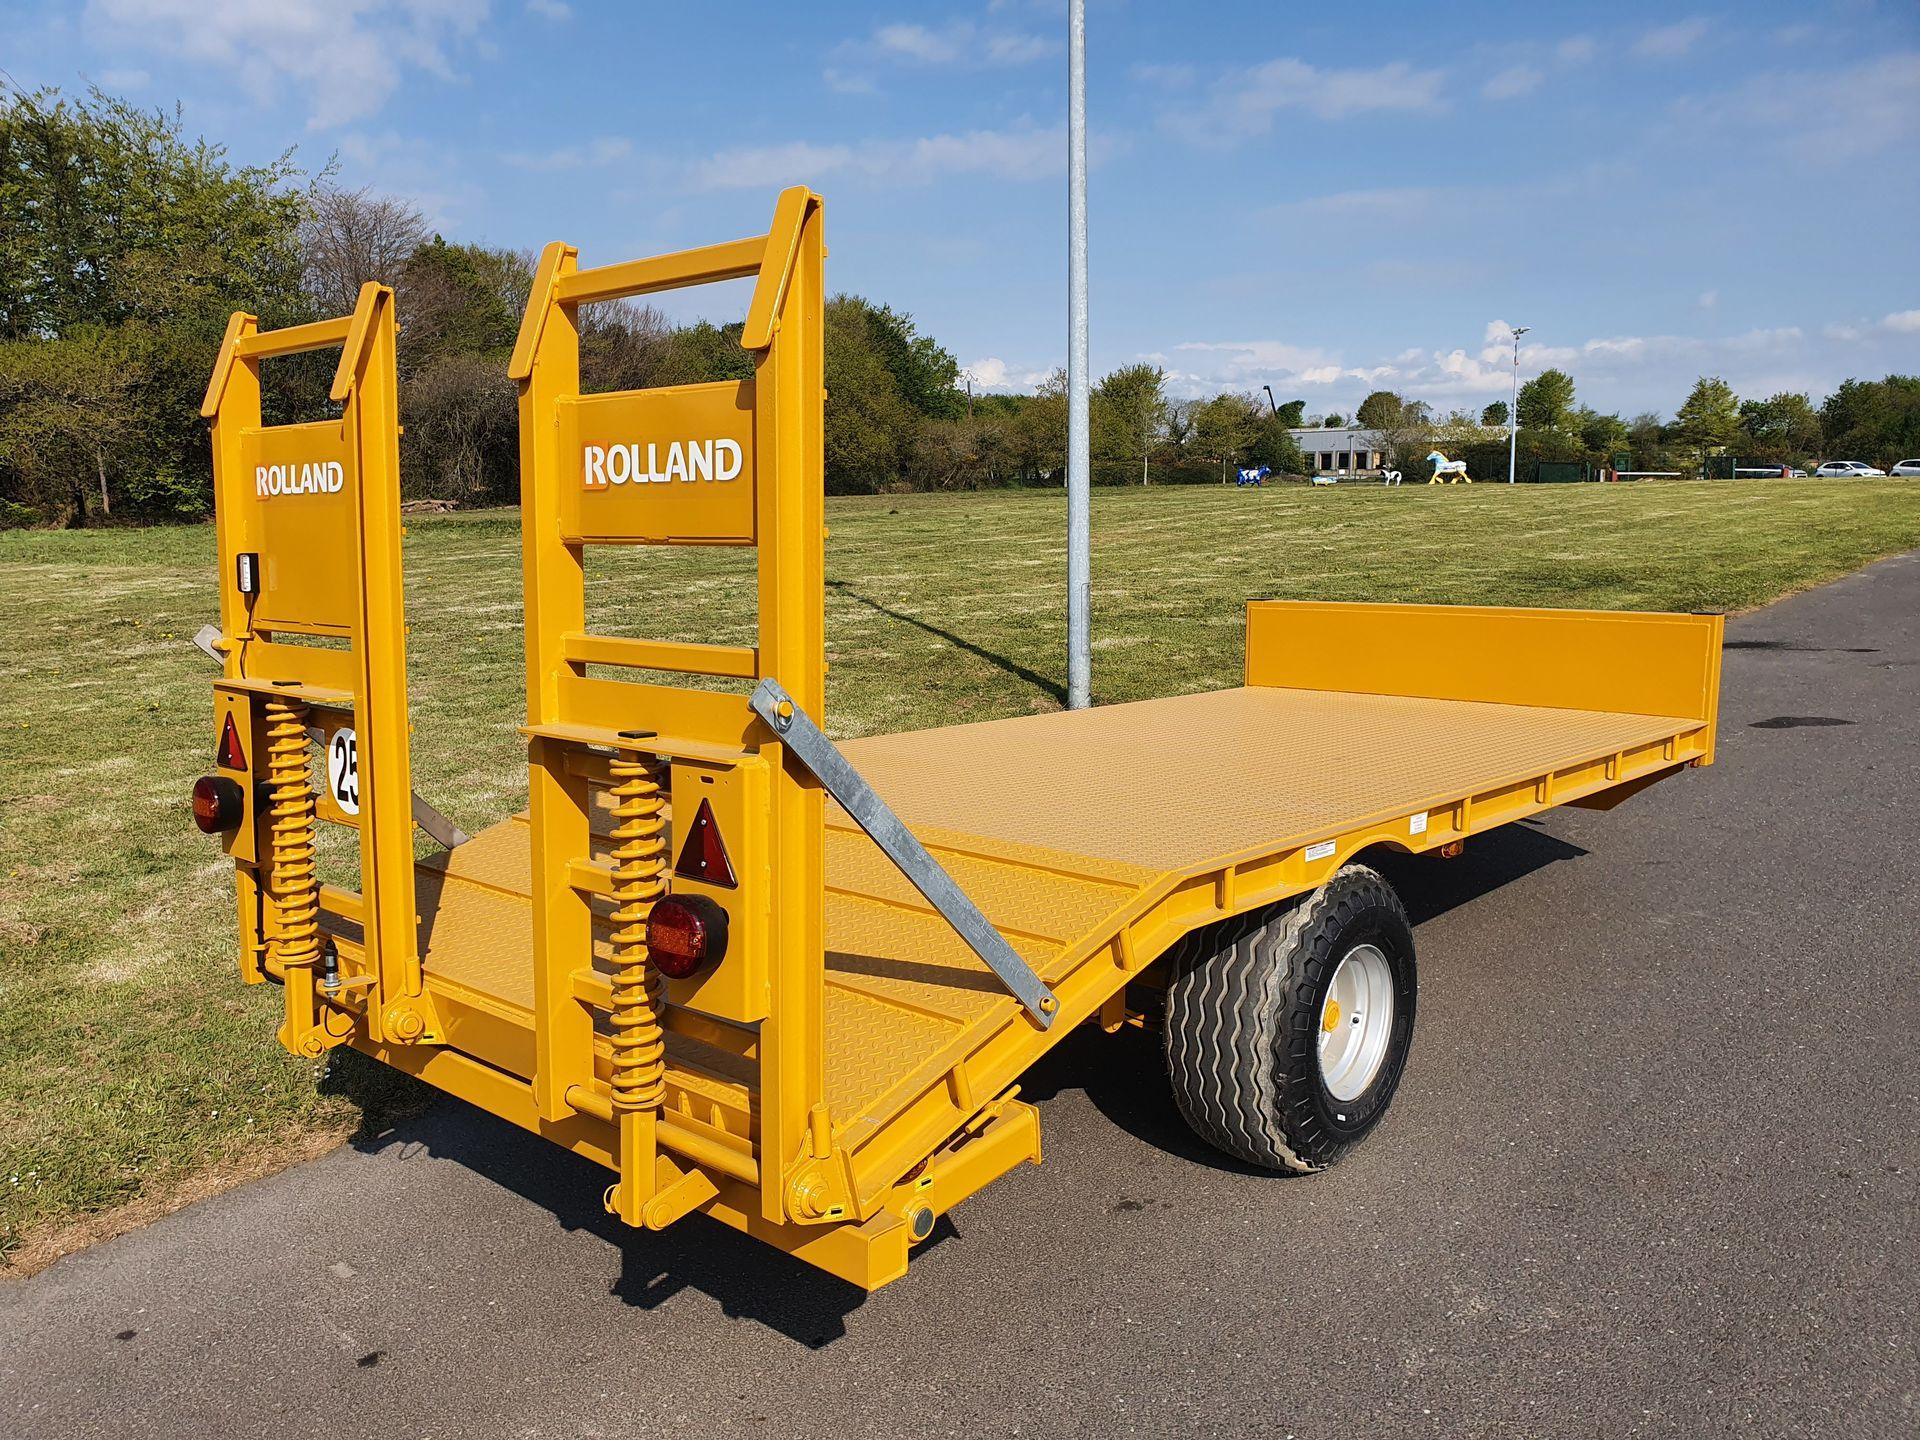 Porte engins pe 60 simple essieu remorques rolland for Porte engin 60 tonnes